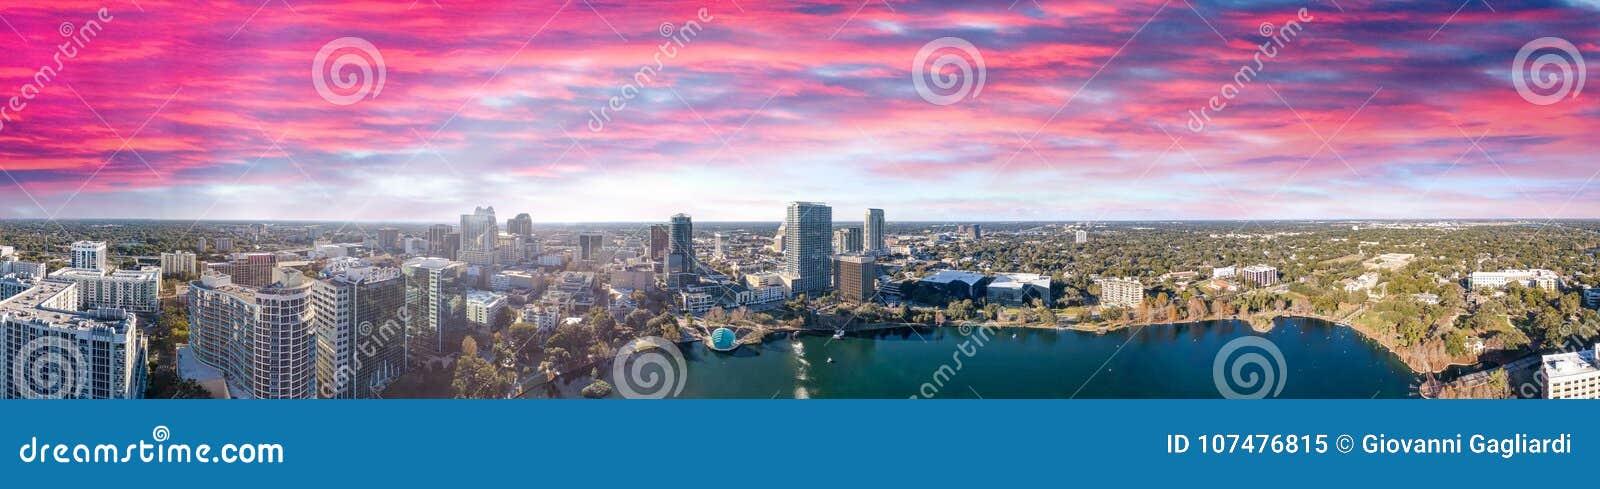 Orlando skyline at sunset, beautiful panoramic view of Florida